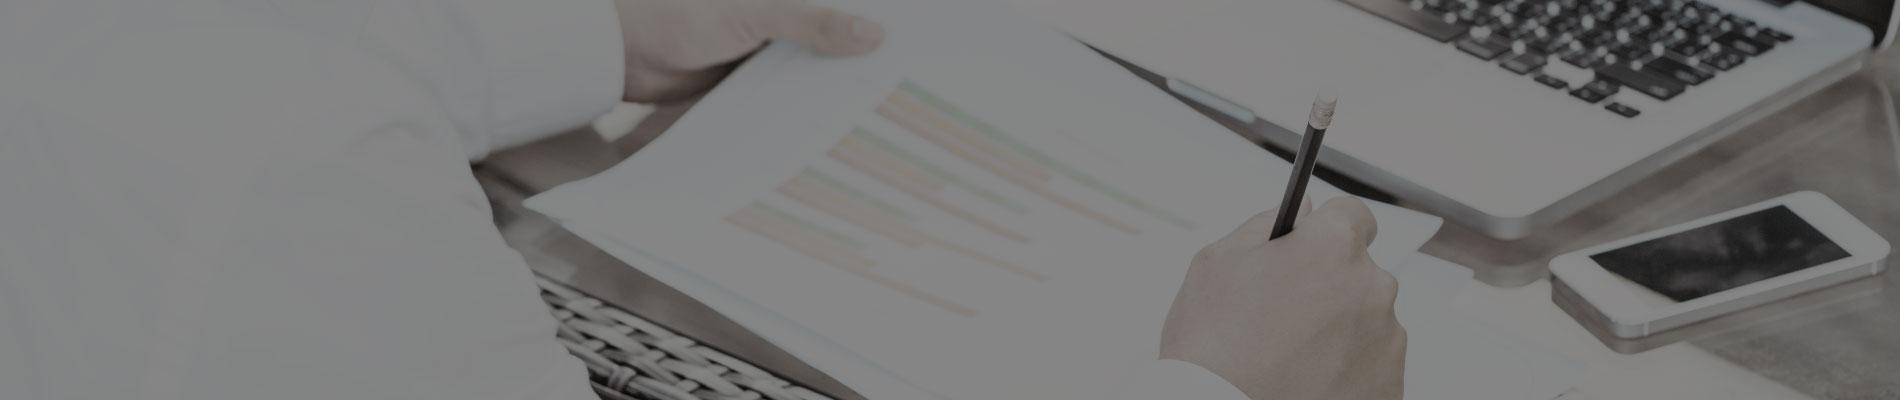 Light |Online Σεμινάριο  Μs Excel 2016 / Βασικό Επίπεδο